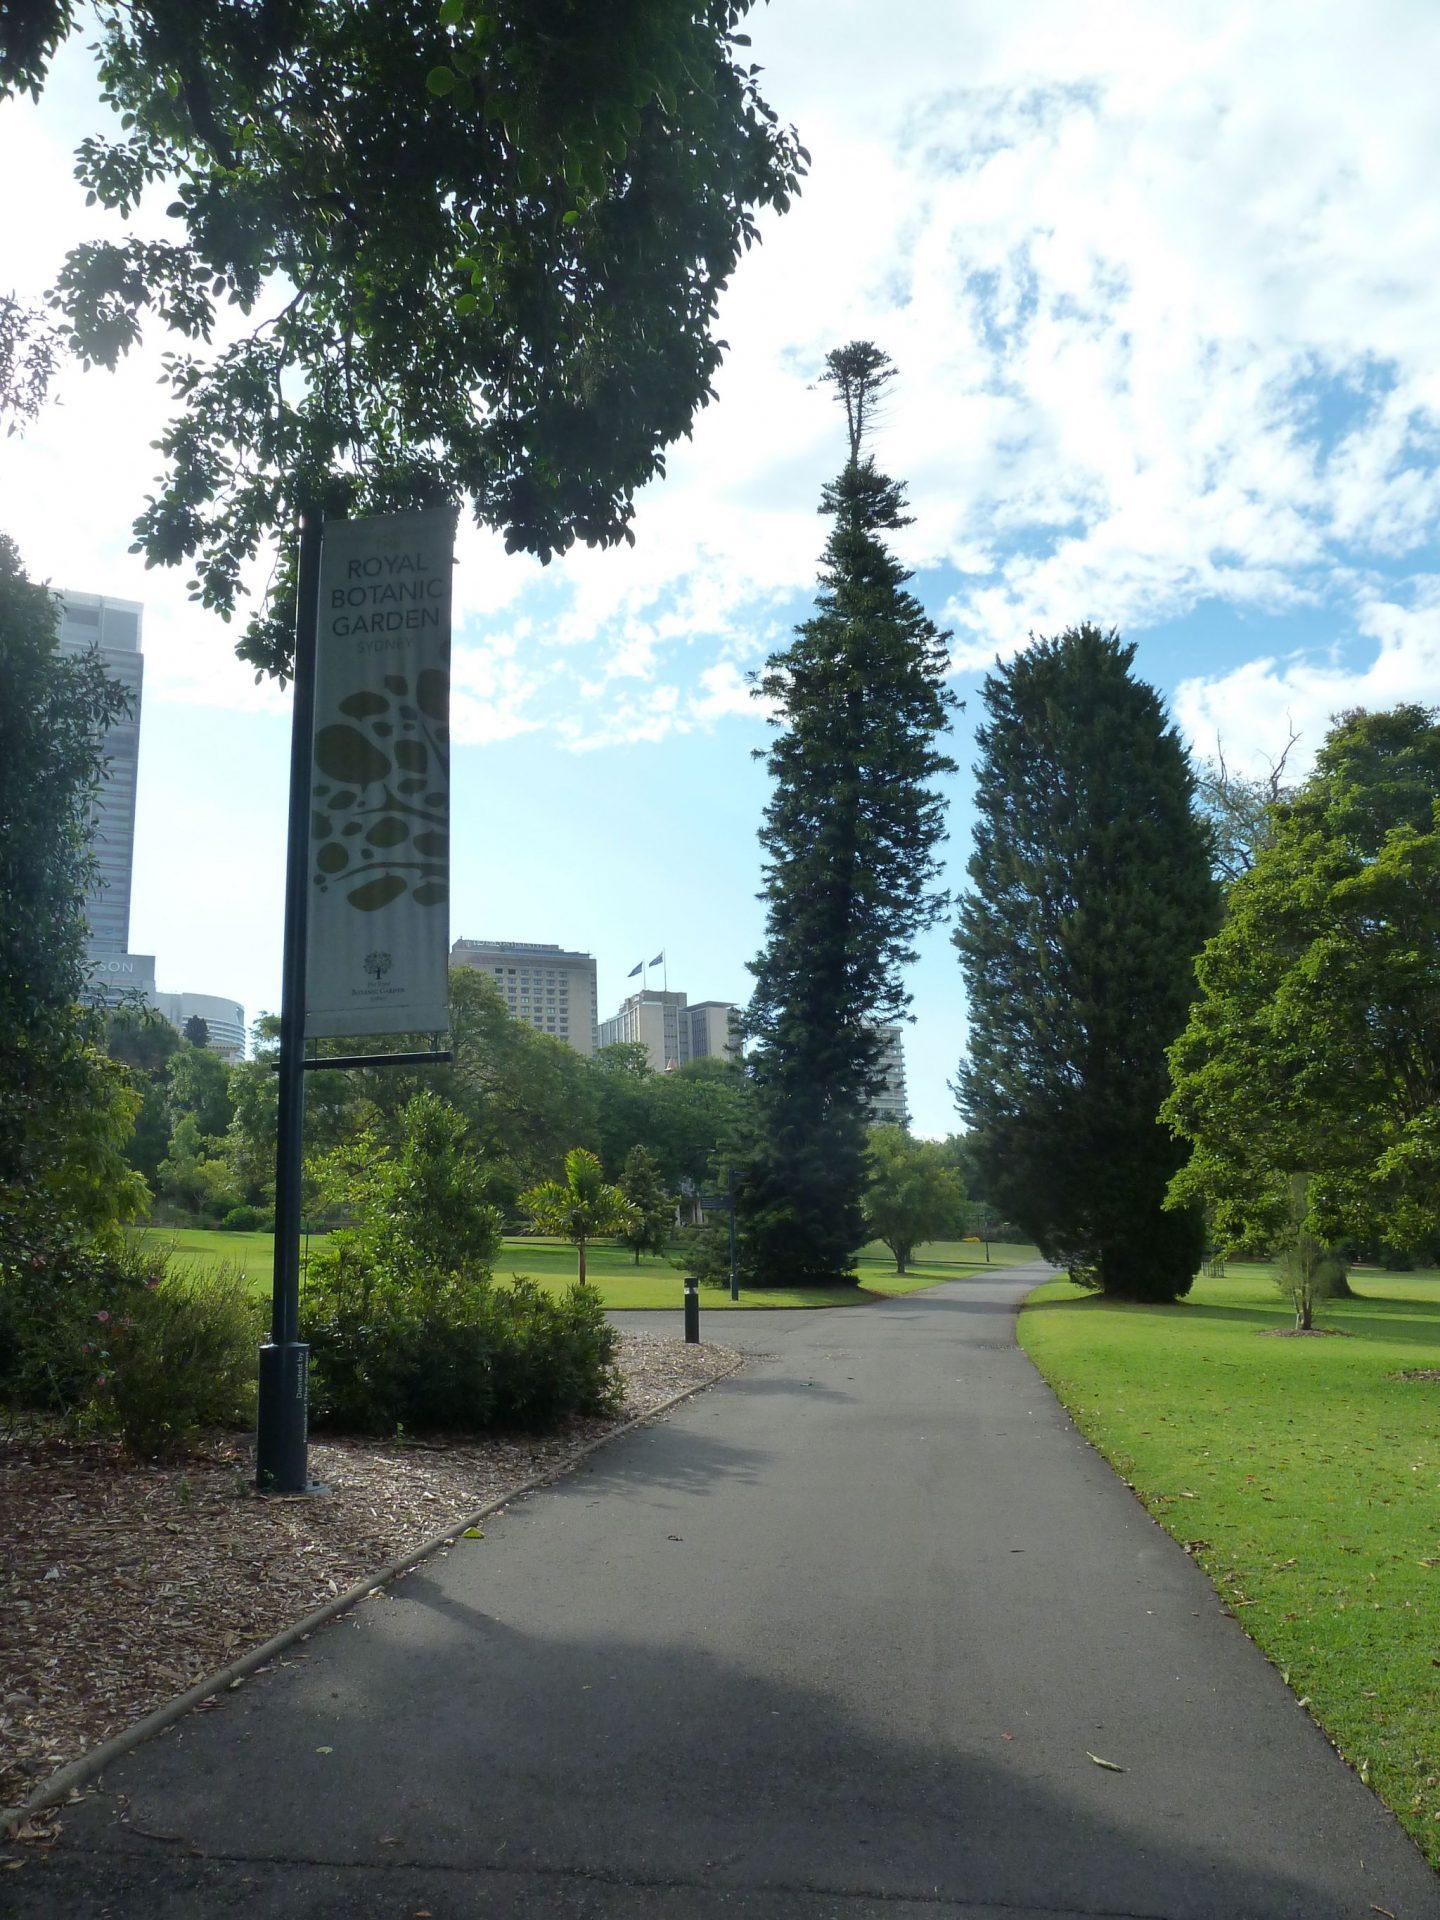 Pathway in the Royal Botanic Gardens Sydney